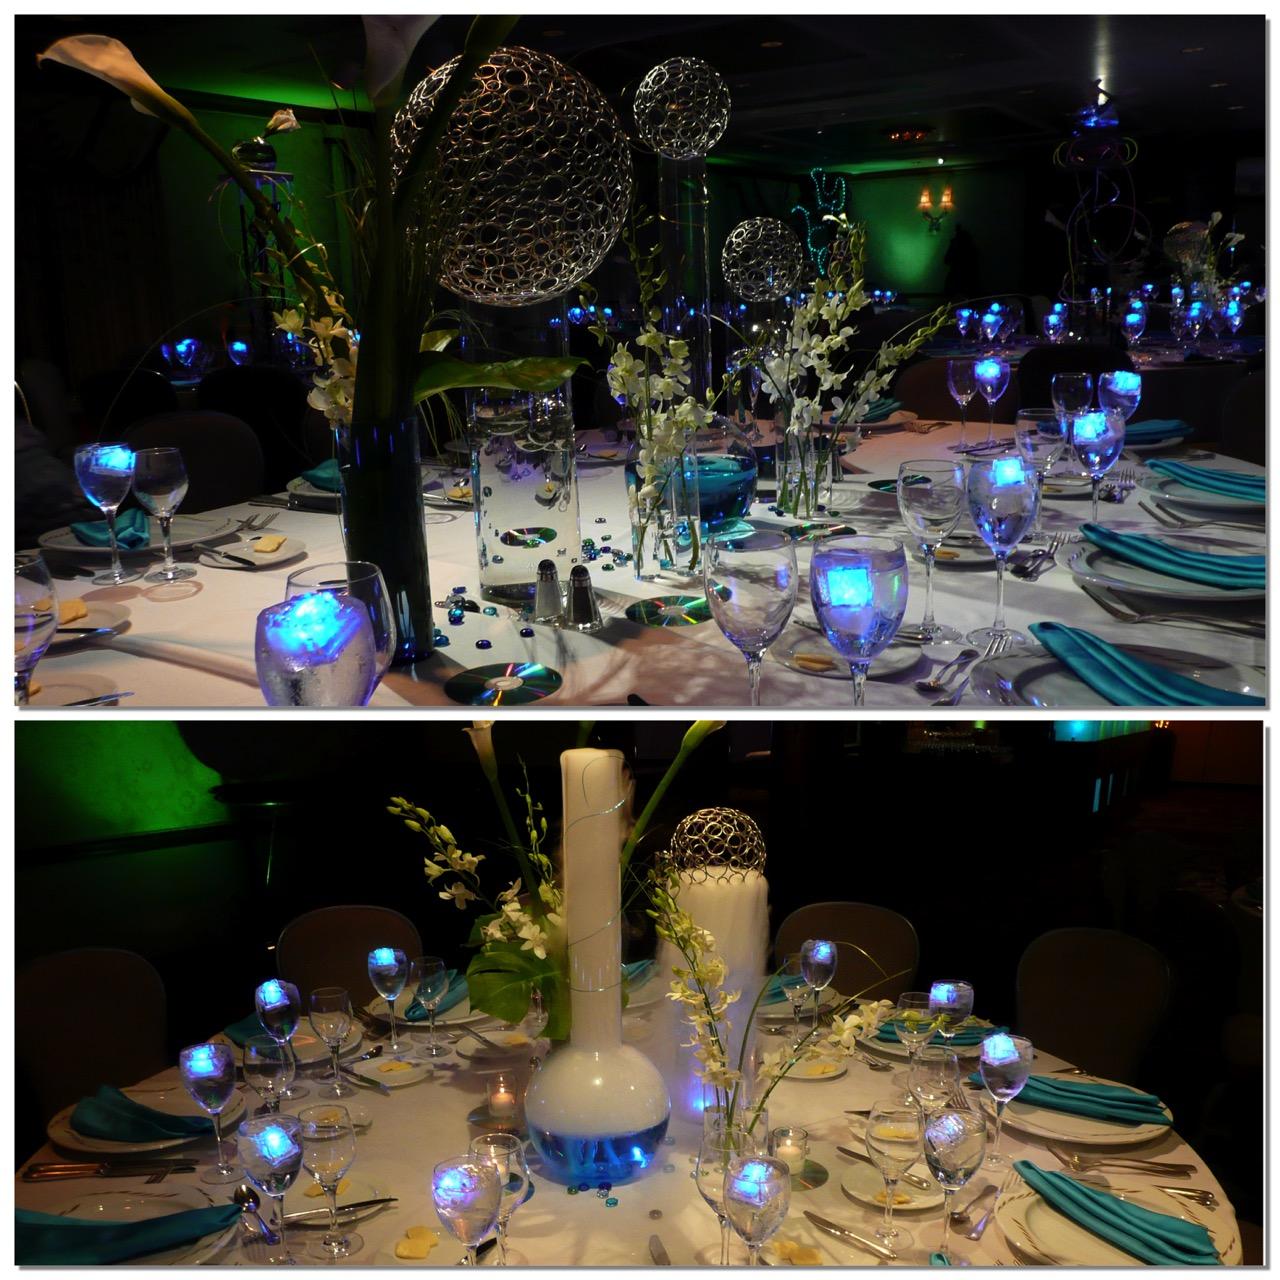 Event+Decor+Design+Lighting+NJ+NYC+Eggsotic+Events+NJs+Best+Event+Decorator+Event+Lighting+Event+Design+Wedding+Bar+Mitzvah+Bat+Mitzvah+Gala+Fundraiser+Social+Corporate+14.jpg